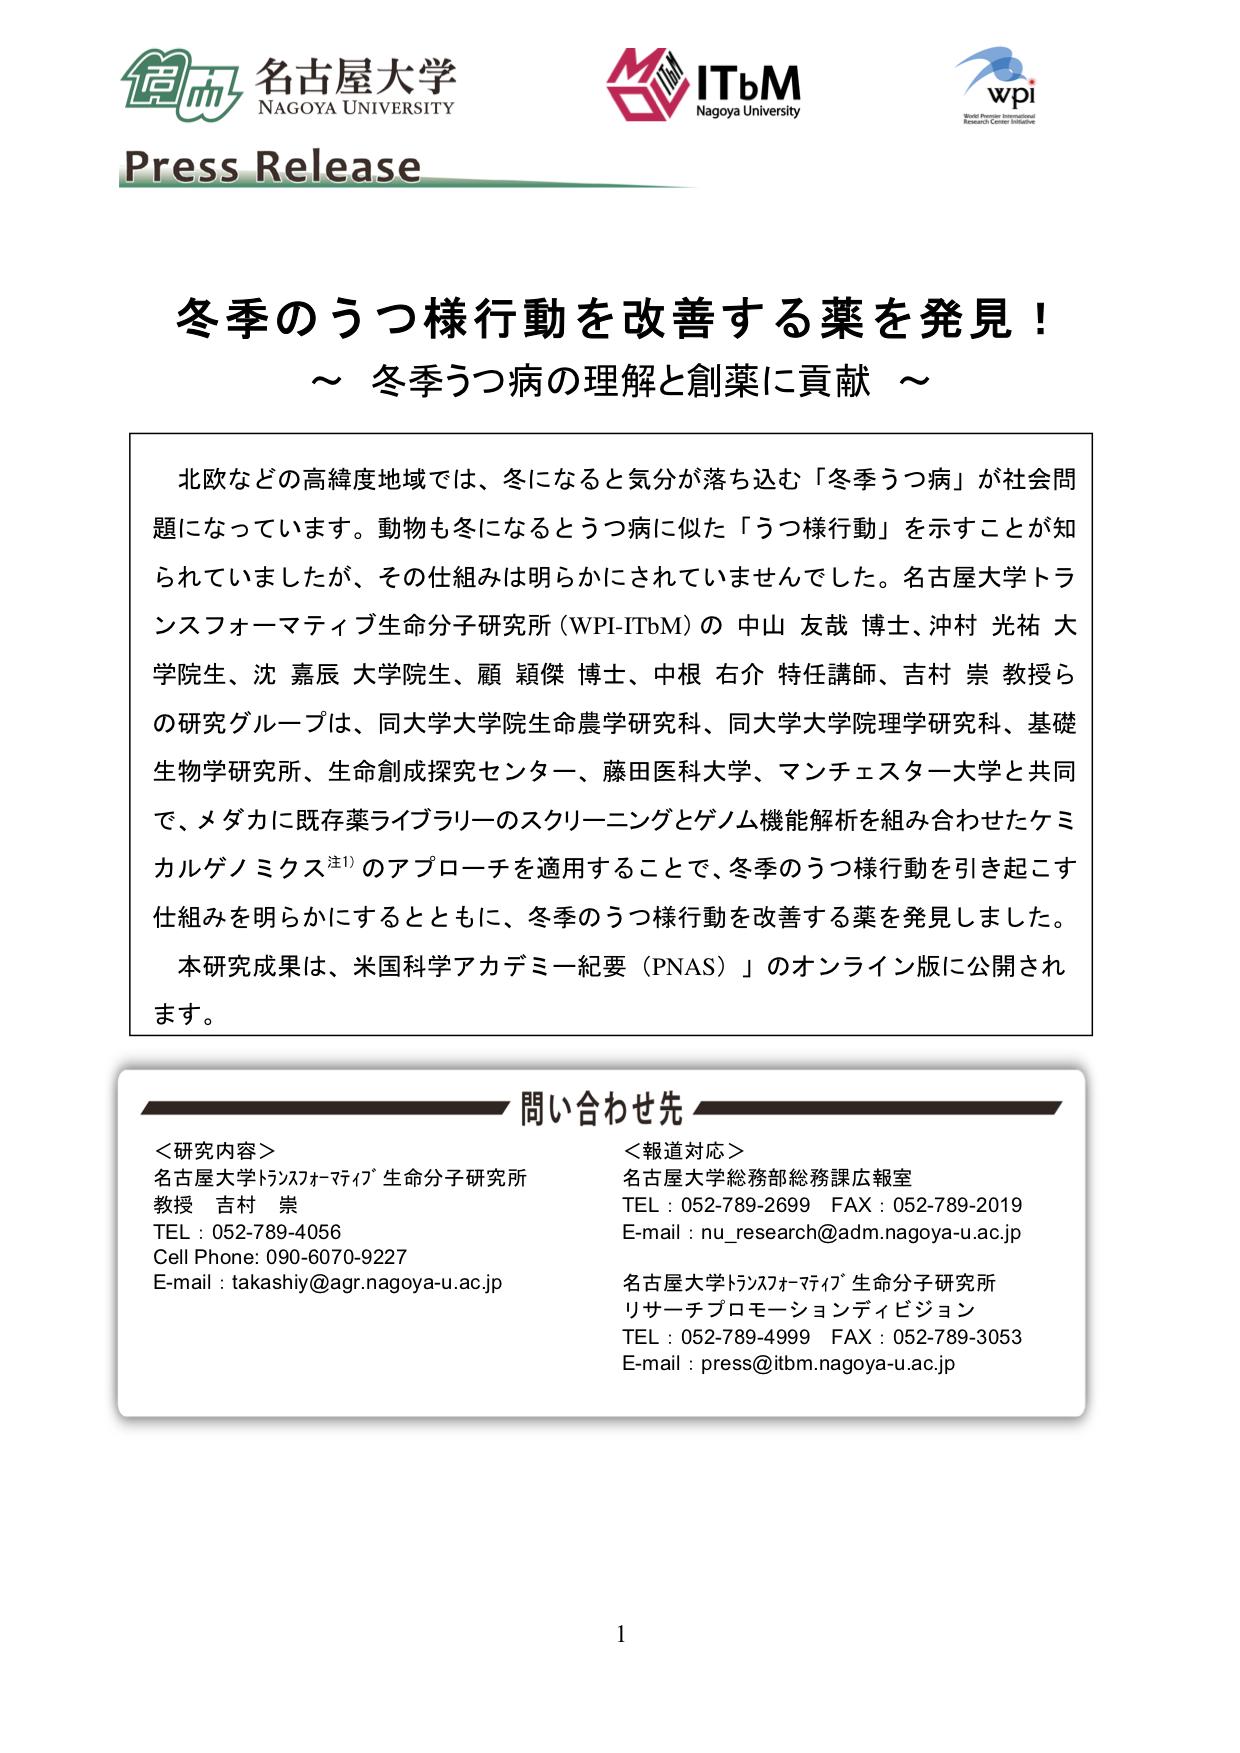 http://www.itbm.nagoya-u.ac.jp/ja/research/20200403_press_yoshimura_HP.png